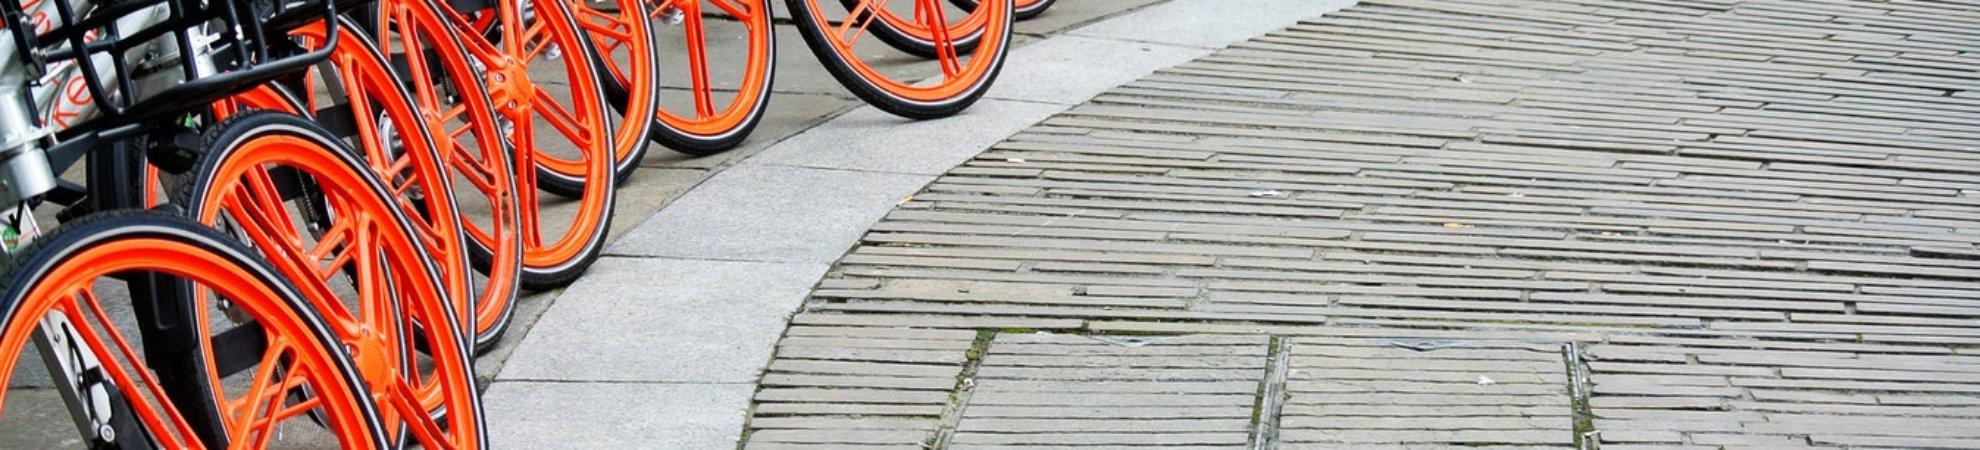 Bike Hire Scheme Dublin